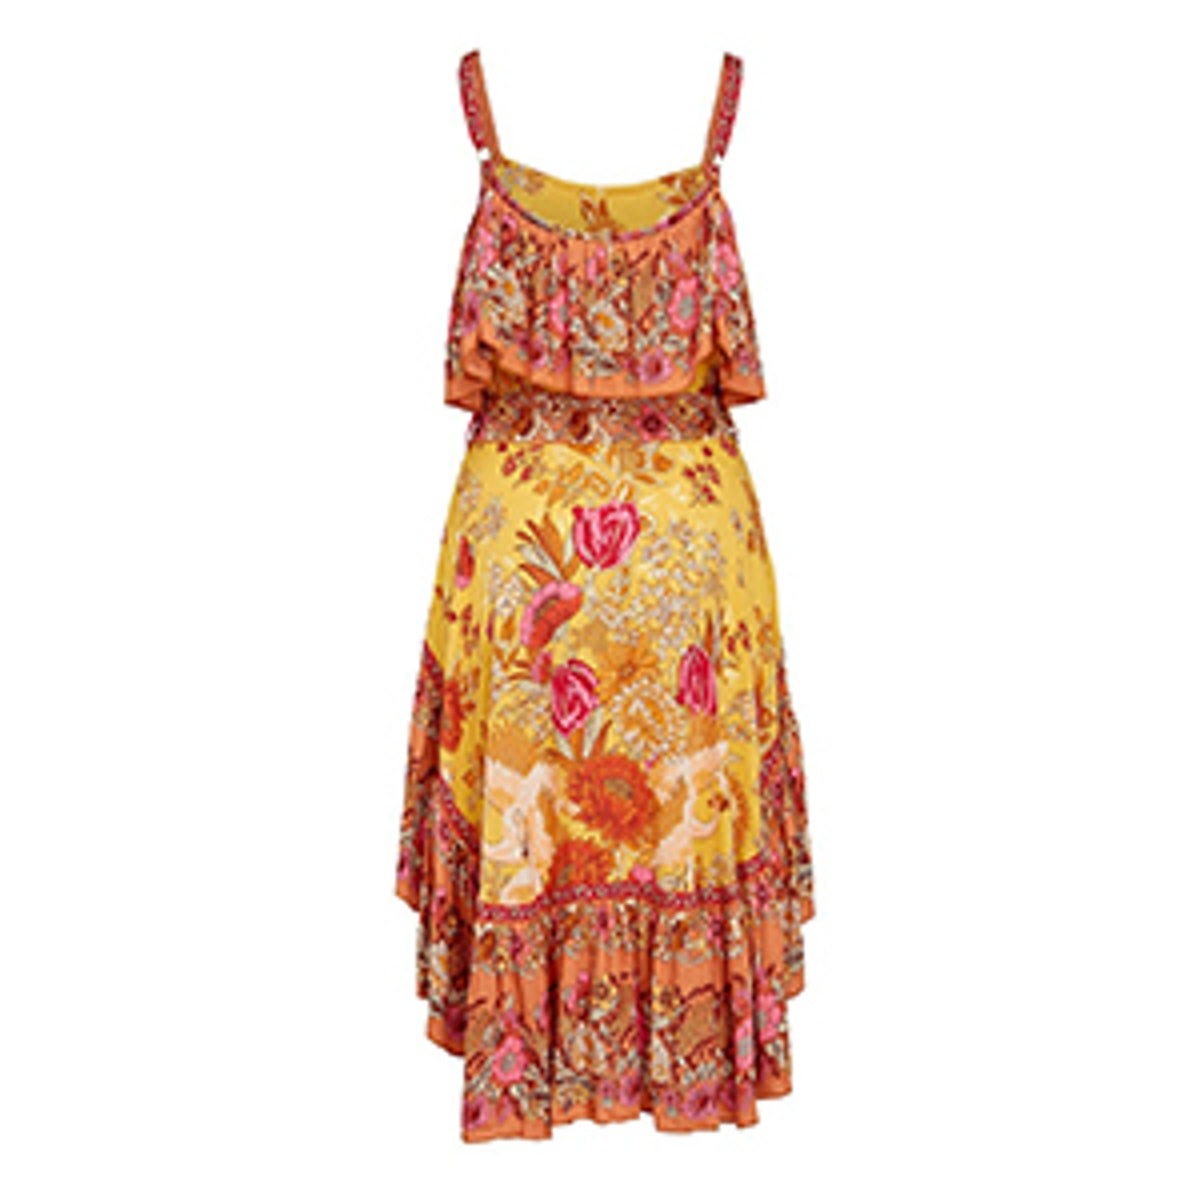 Siren Song Strappy Dress